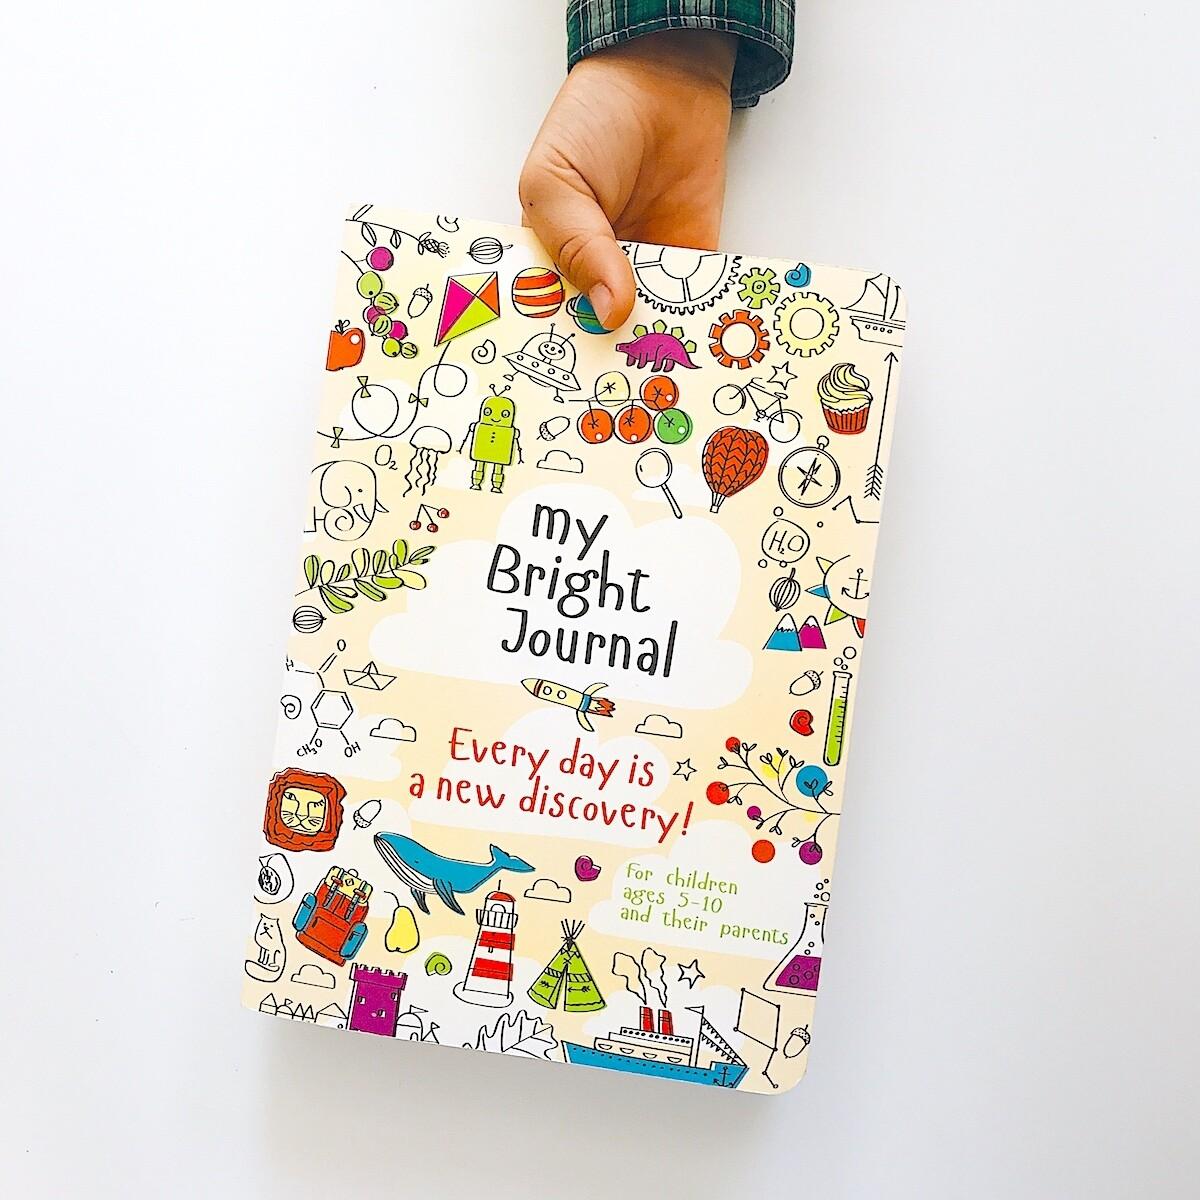 My Bright Journal